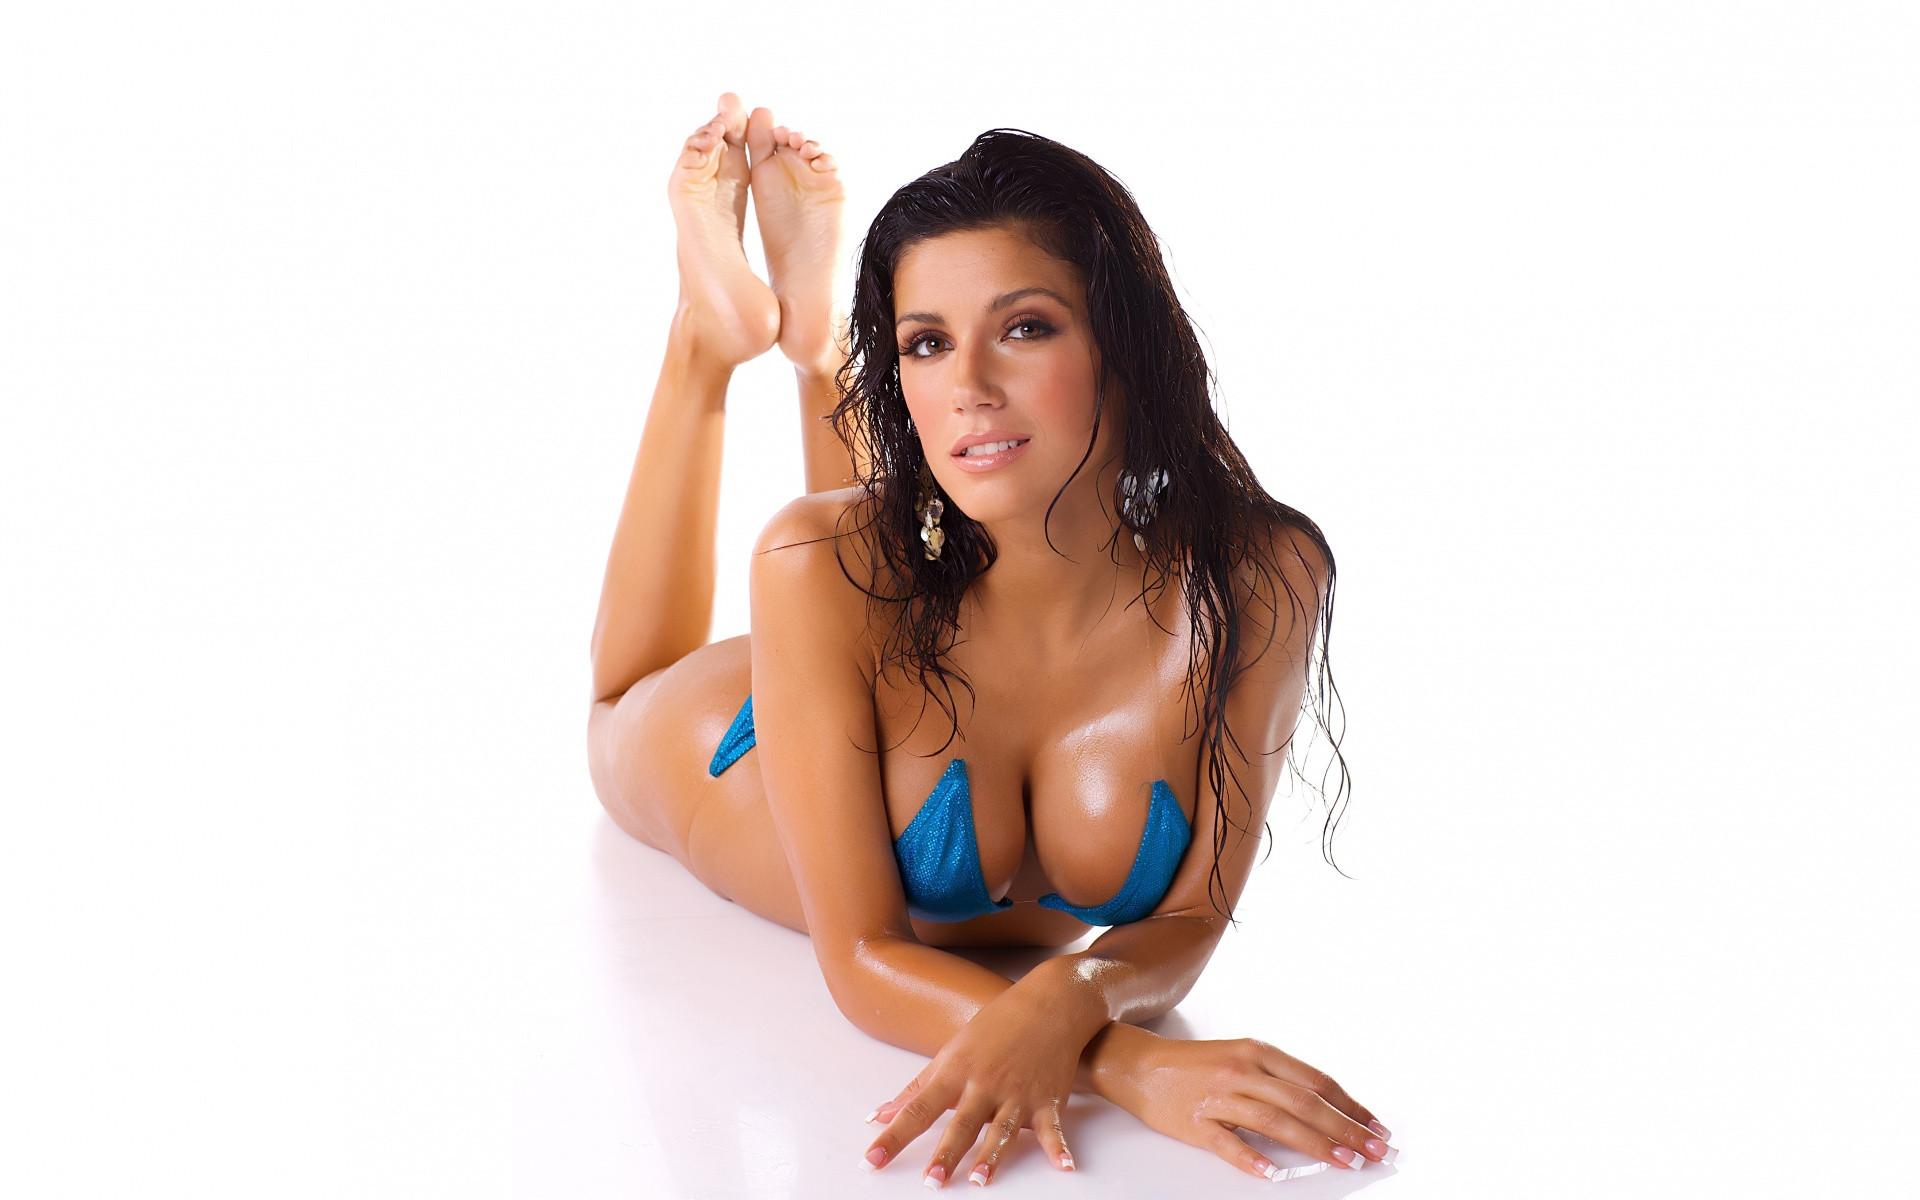 wet sexy brunette model blue bikini outfit 1920x1200